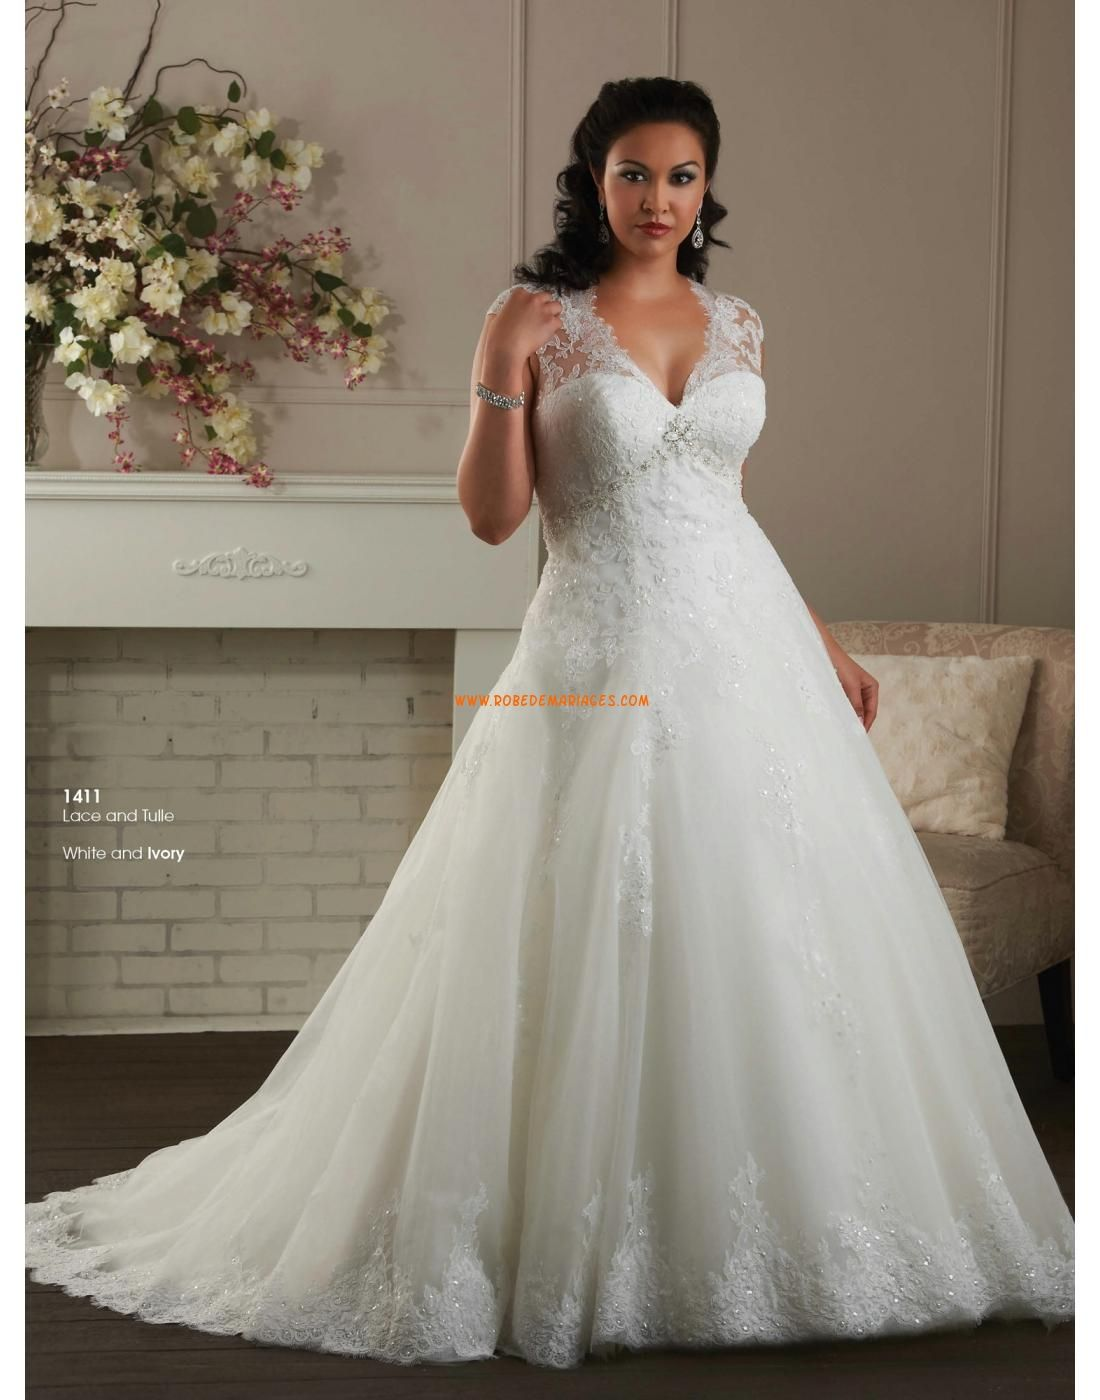 robe de mari e grande taille en tulle dentelle applique col en v femme princesse robe de. Black Bedroom Furniture Sets. Home Design Ideas